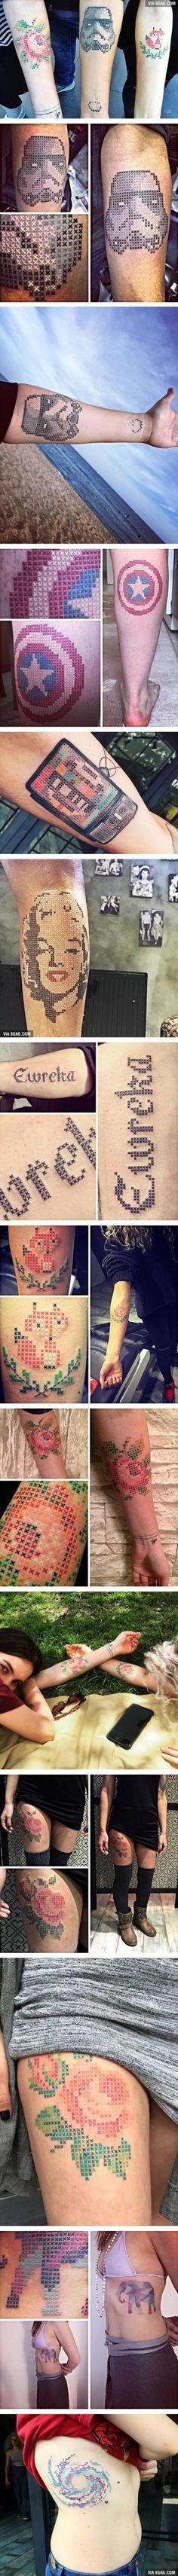 Tattoo artist creates intricate cross-stitched designs (By Eva Krbdk)